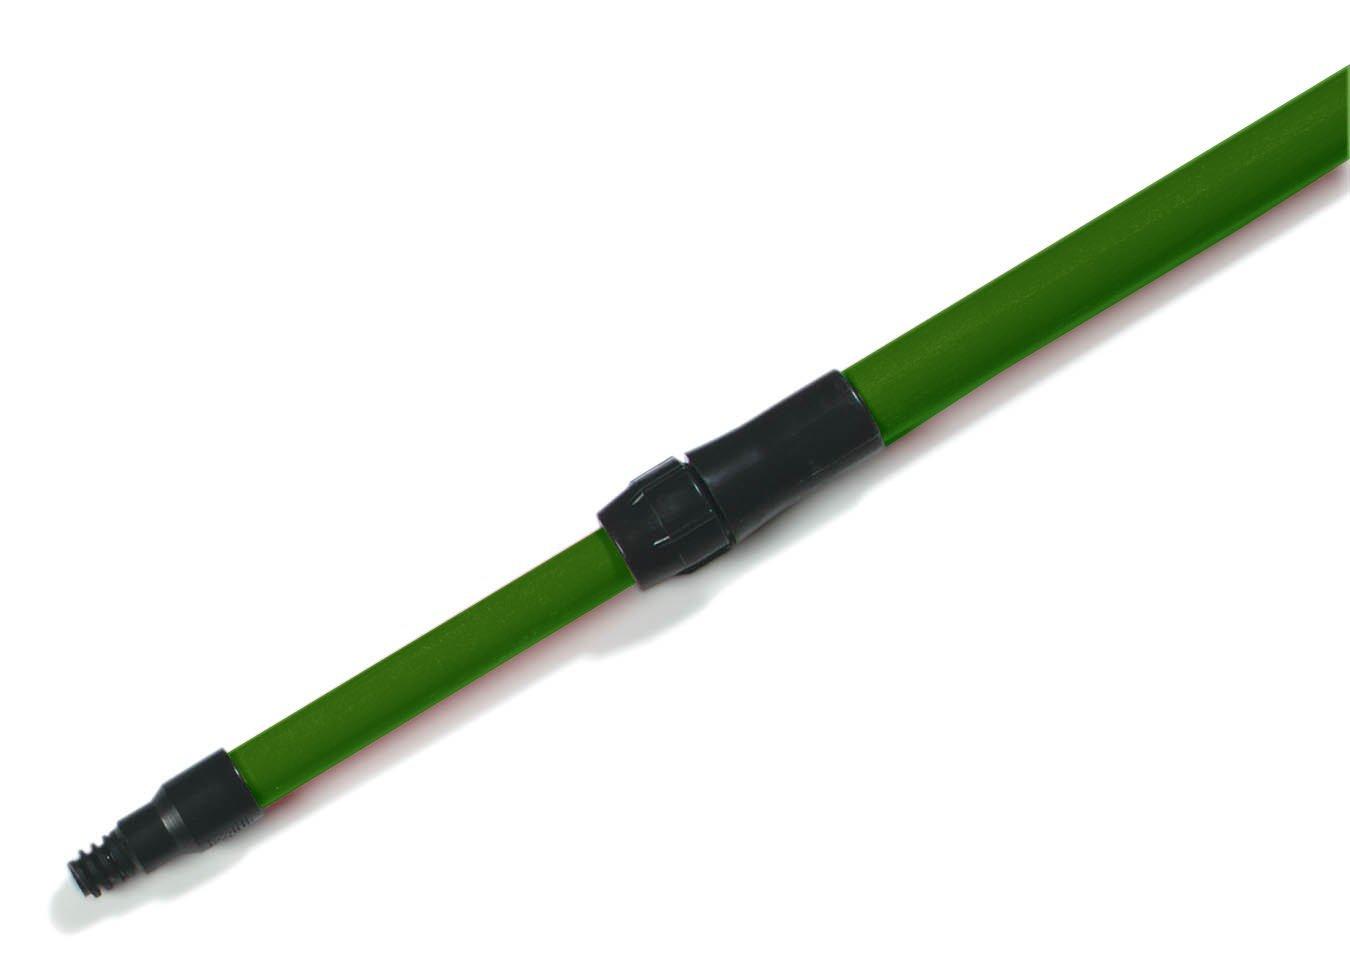 Carlisle 4102009 Sparta Spectrum Fiberglass Telescopic Threaded Handle, 1'' Dia. x 54'' to 8', Green (Case of 12)